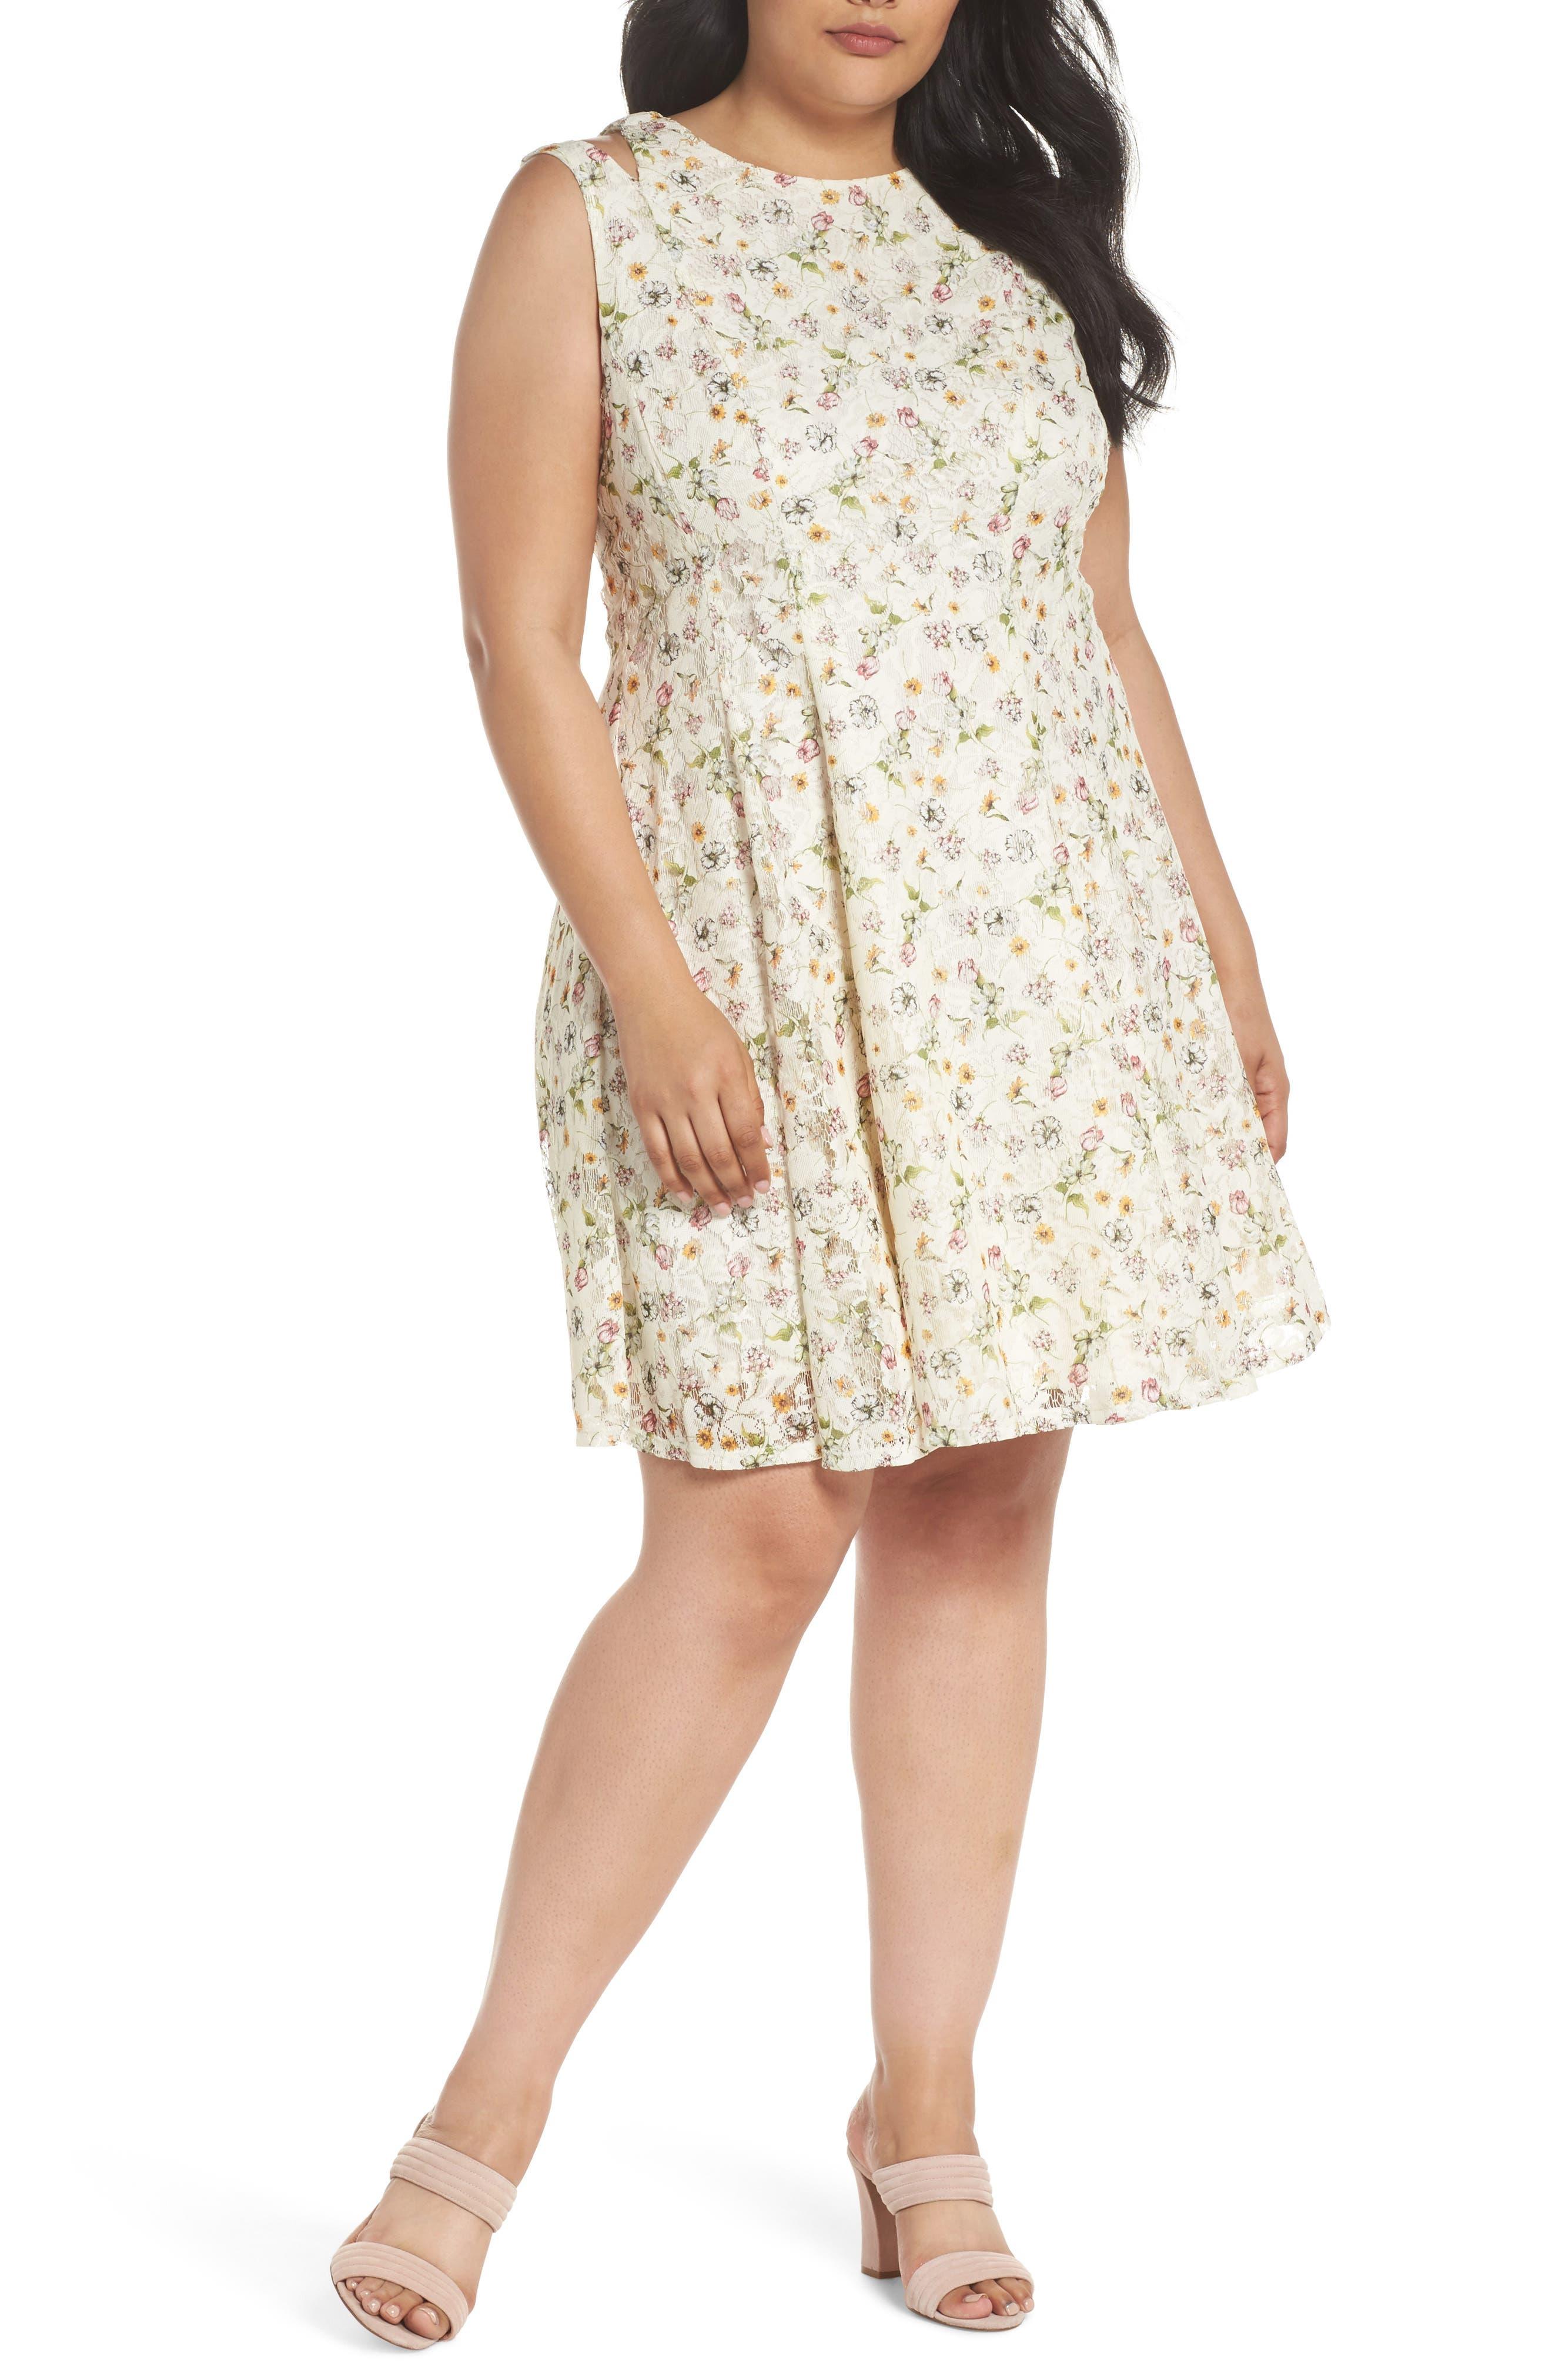 Alternate Image 1 Selected - Gabby Skye Cutout Shoulder Floral Print Lace Dress (Plus Size)